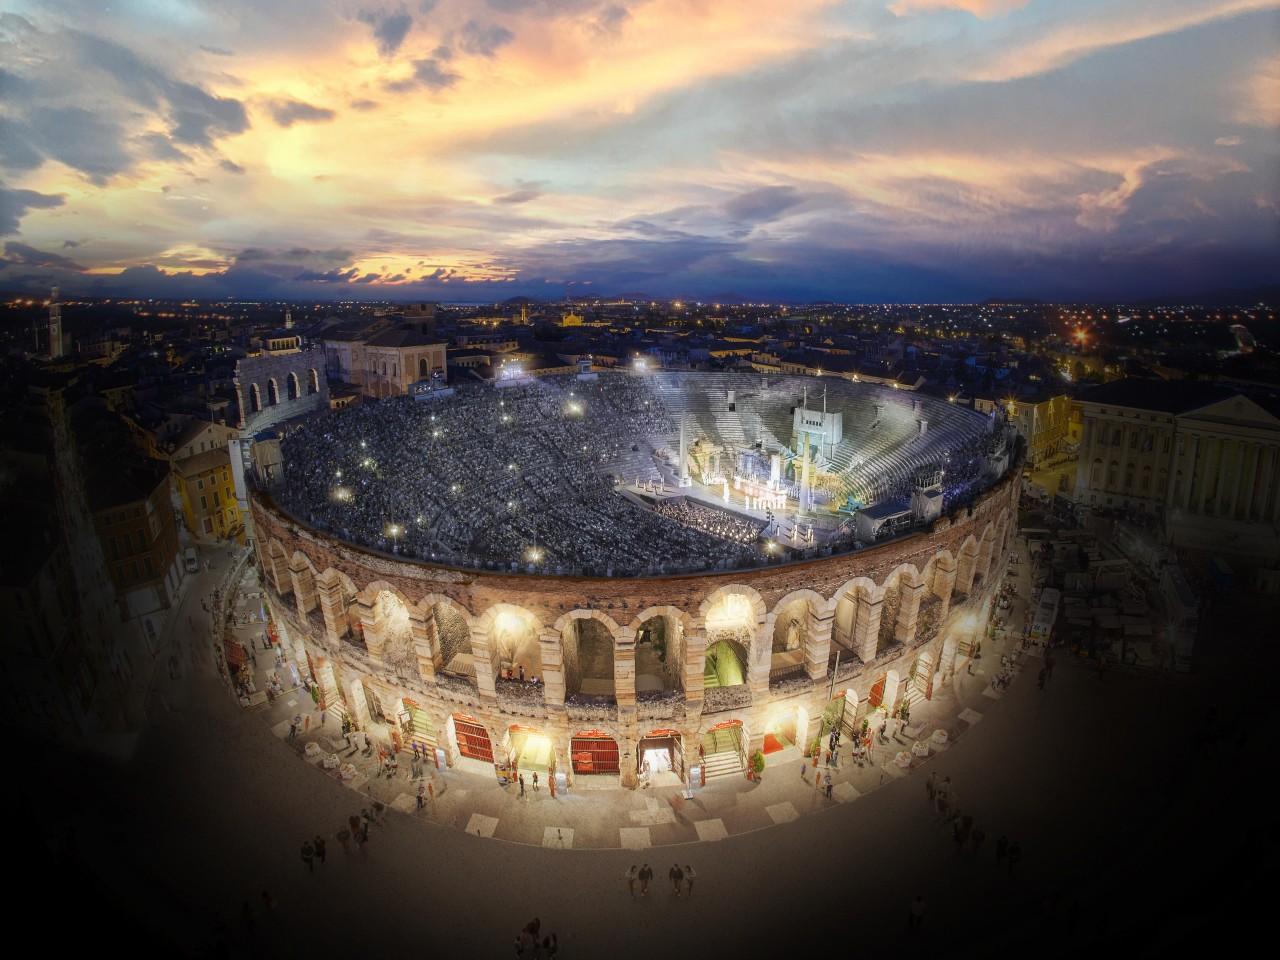 2020 Verona Opera Festival - Postponed to 2021